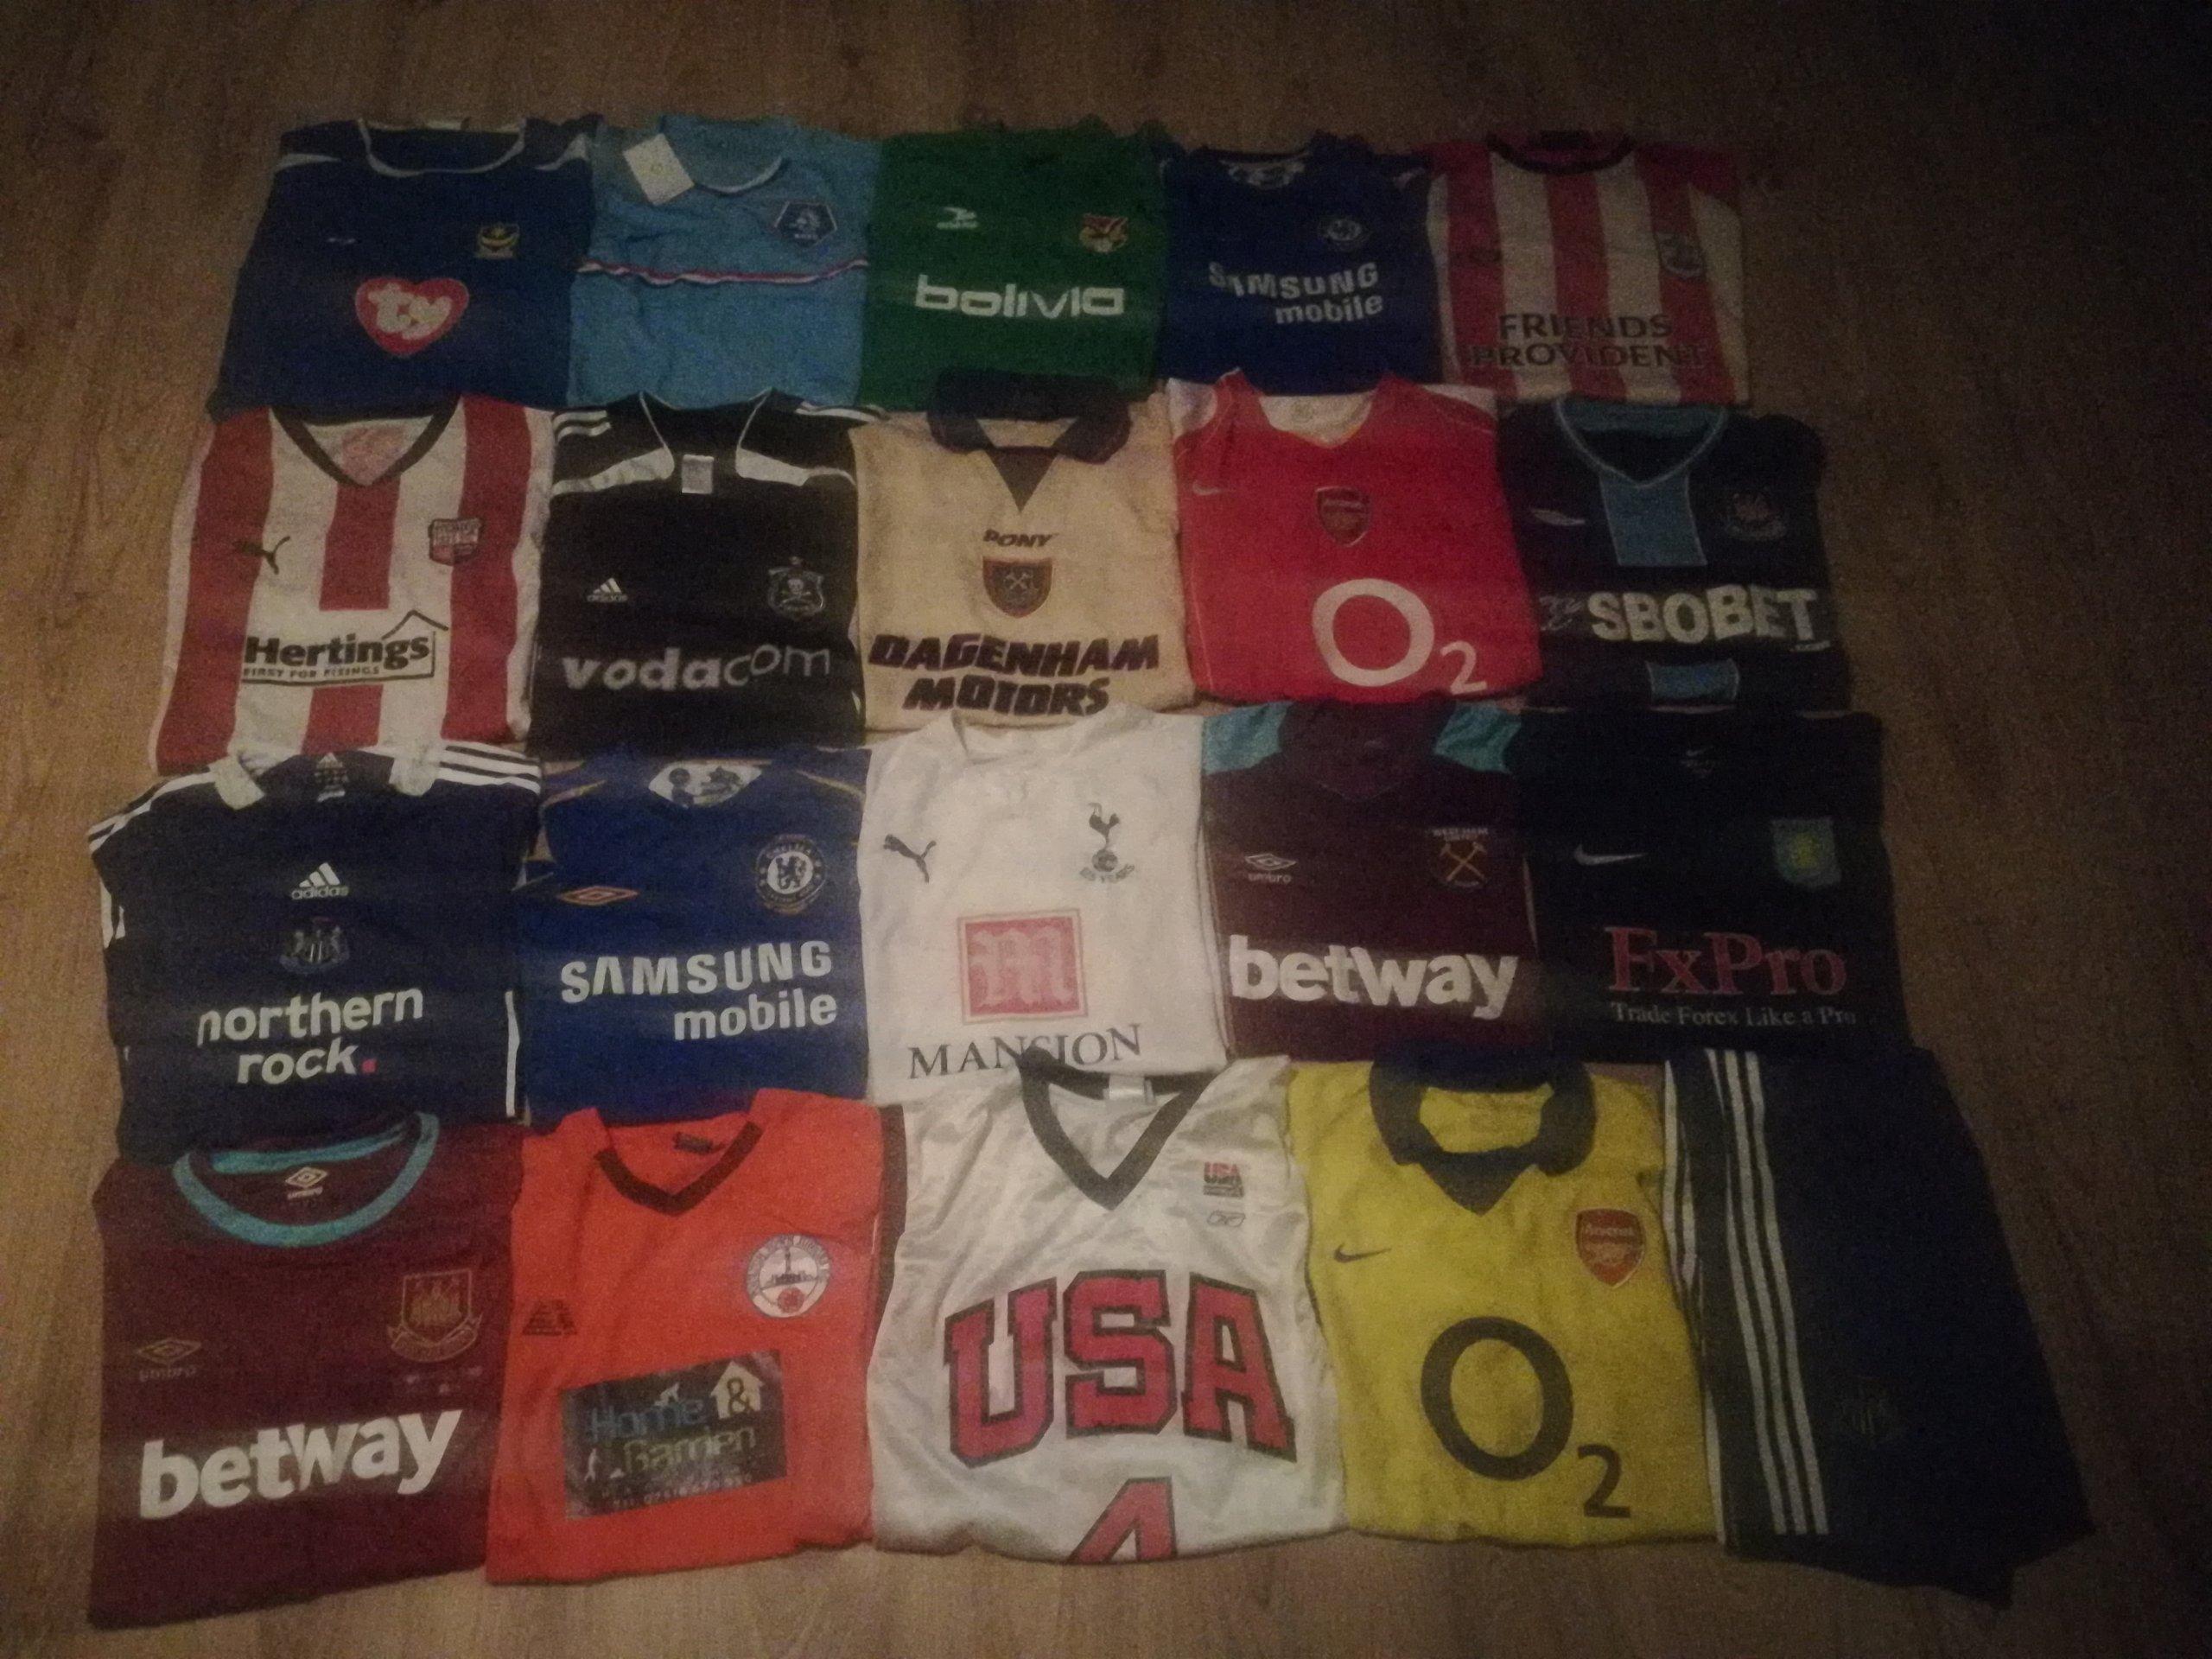 dd611cd2b Koszulki piłkarskie klubowe West Ham Arsenal!!! - 7353383269 ...